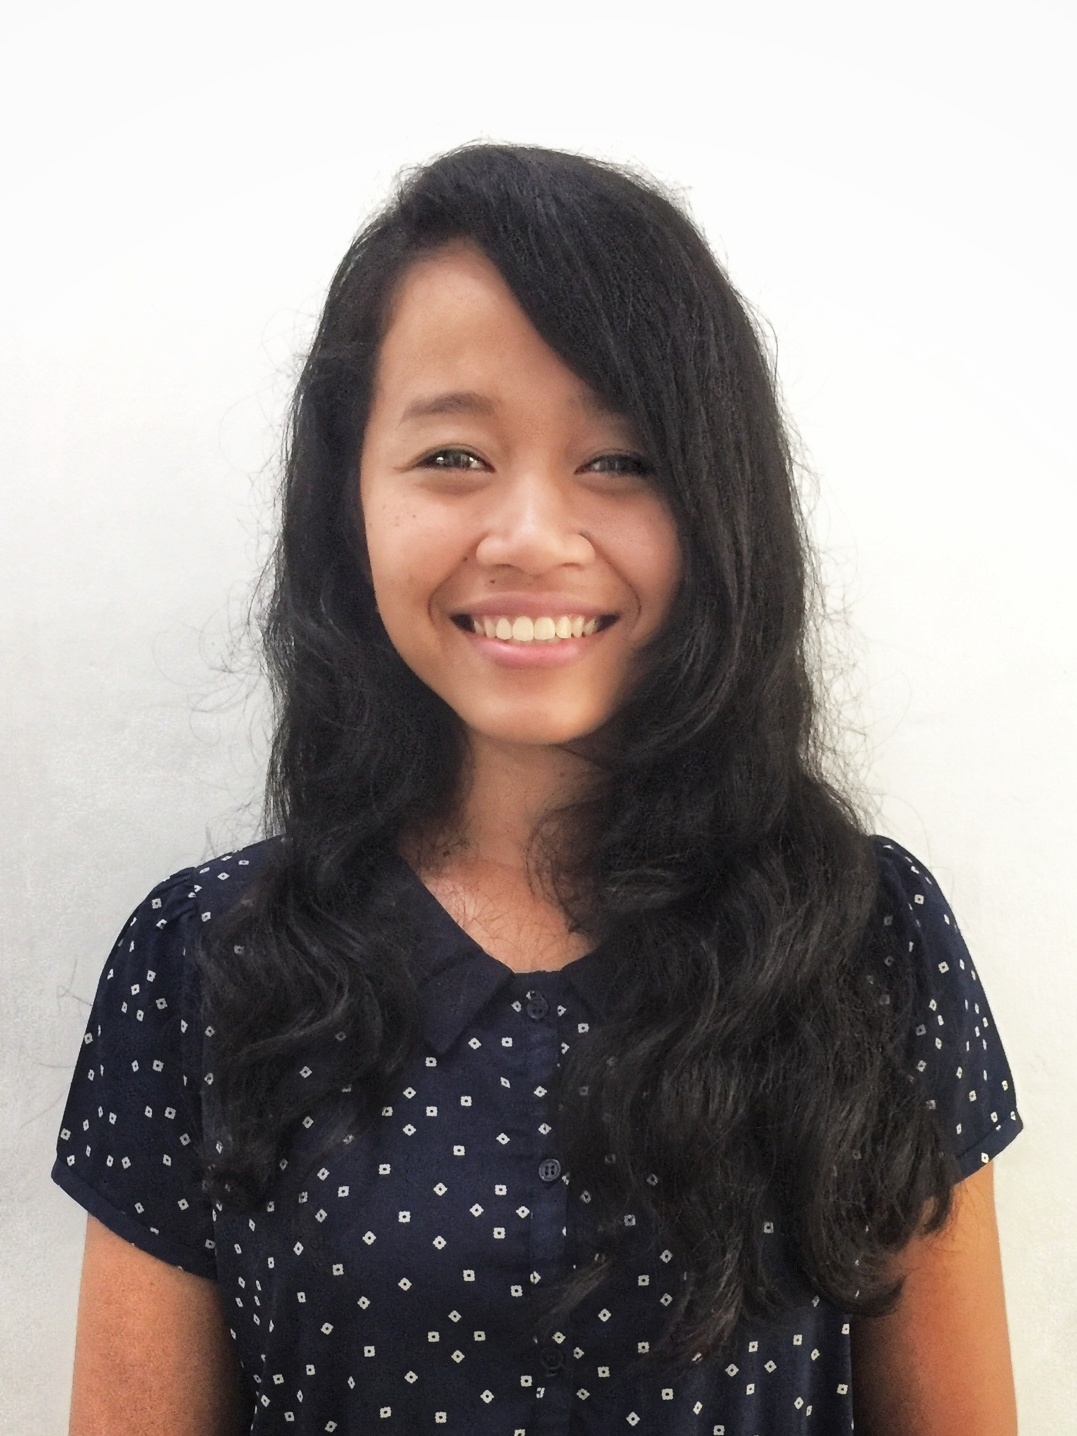 Yoana Wida Kristiawati